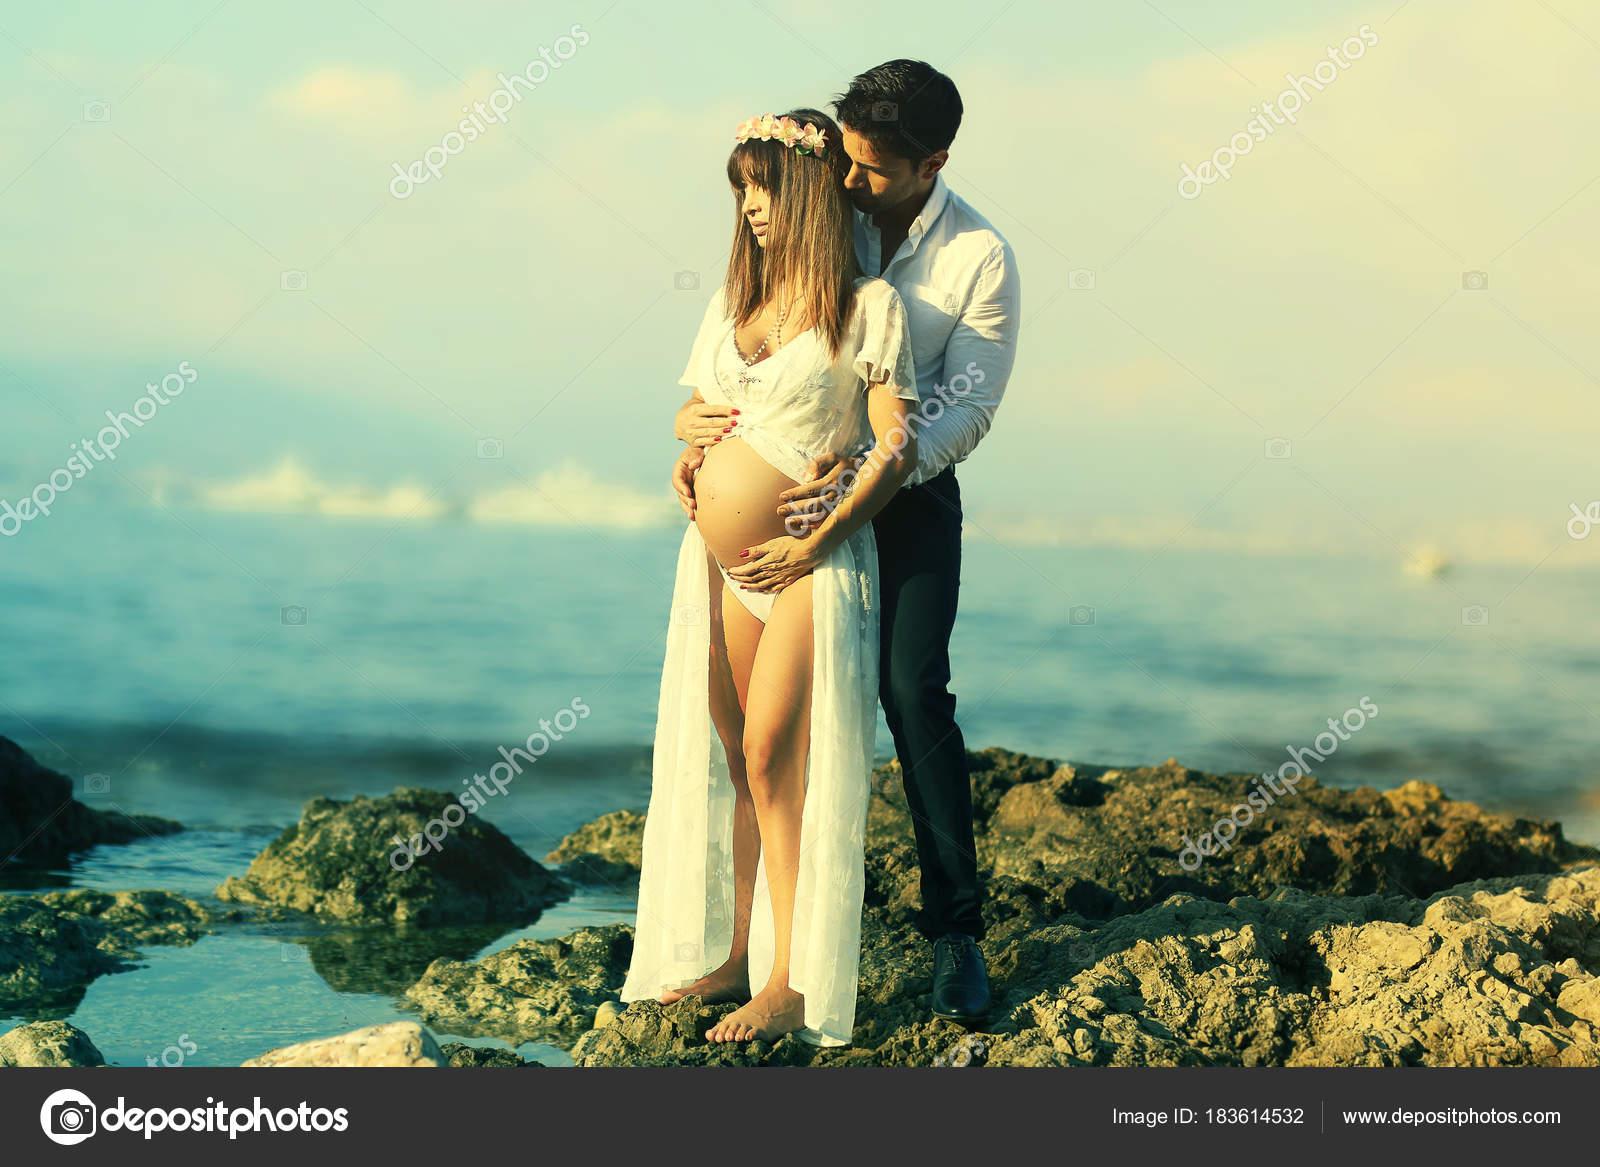 Happy Young Couple Expecting Baby Background Sea Romantic Pregnancy Portrait Stock Photo C Rdrgraphe 183614532